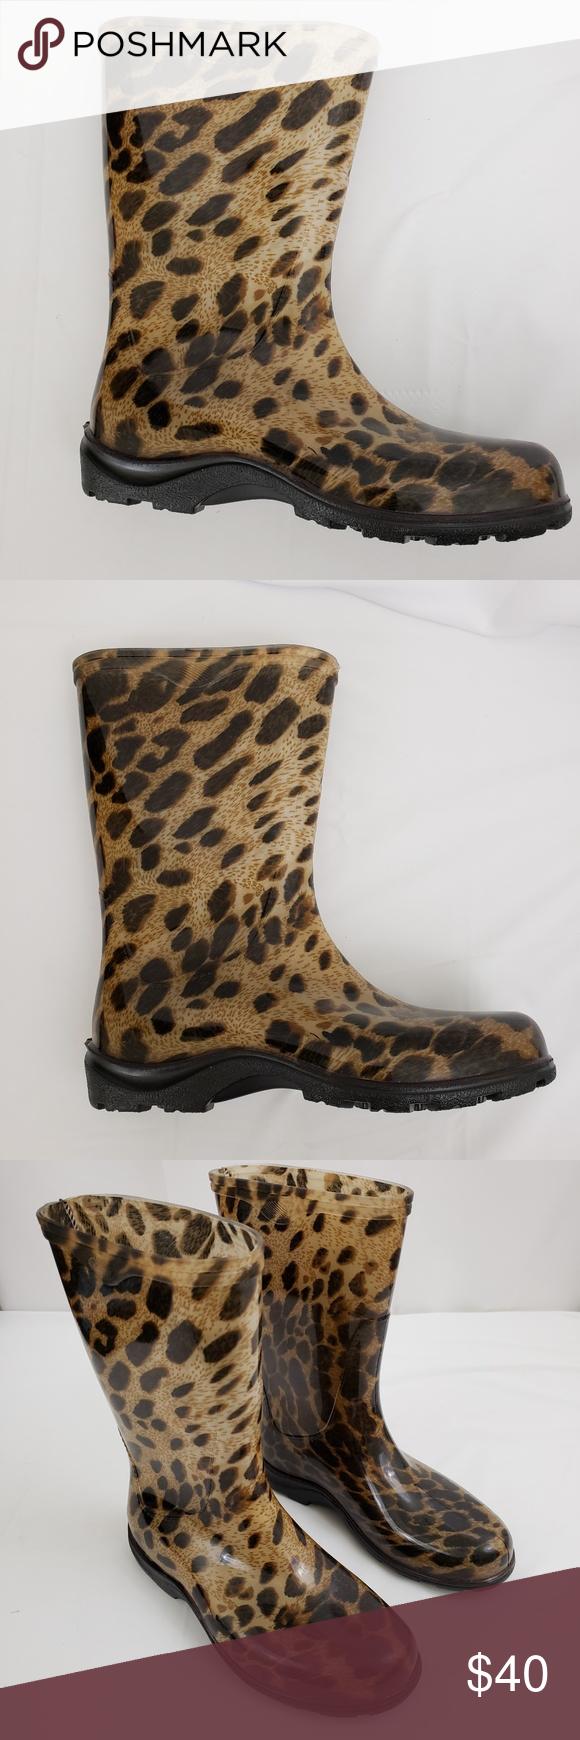 Sloggers rain garden boots cheeta size 7 | Pinterest | Garden boots ...